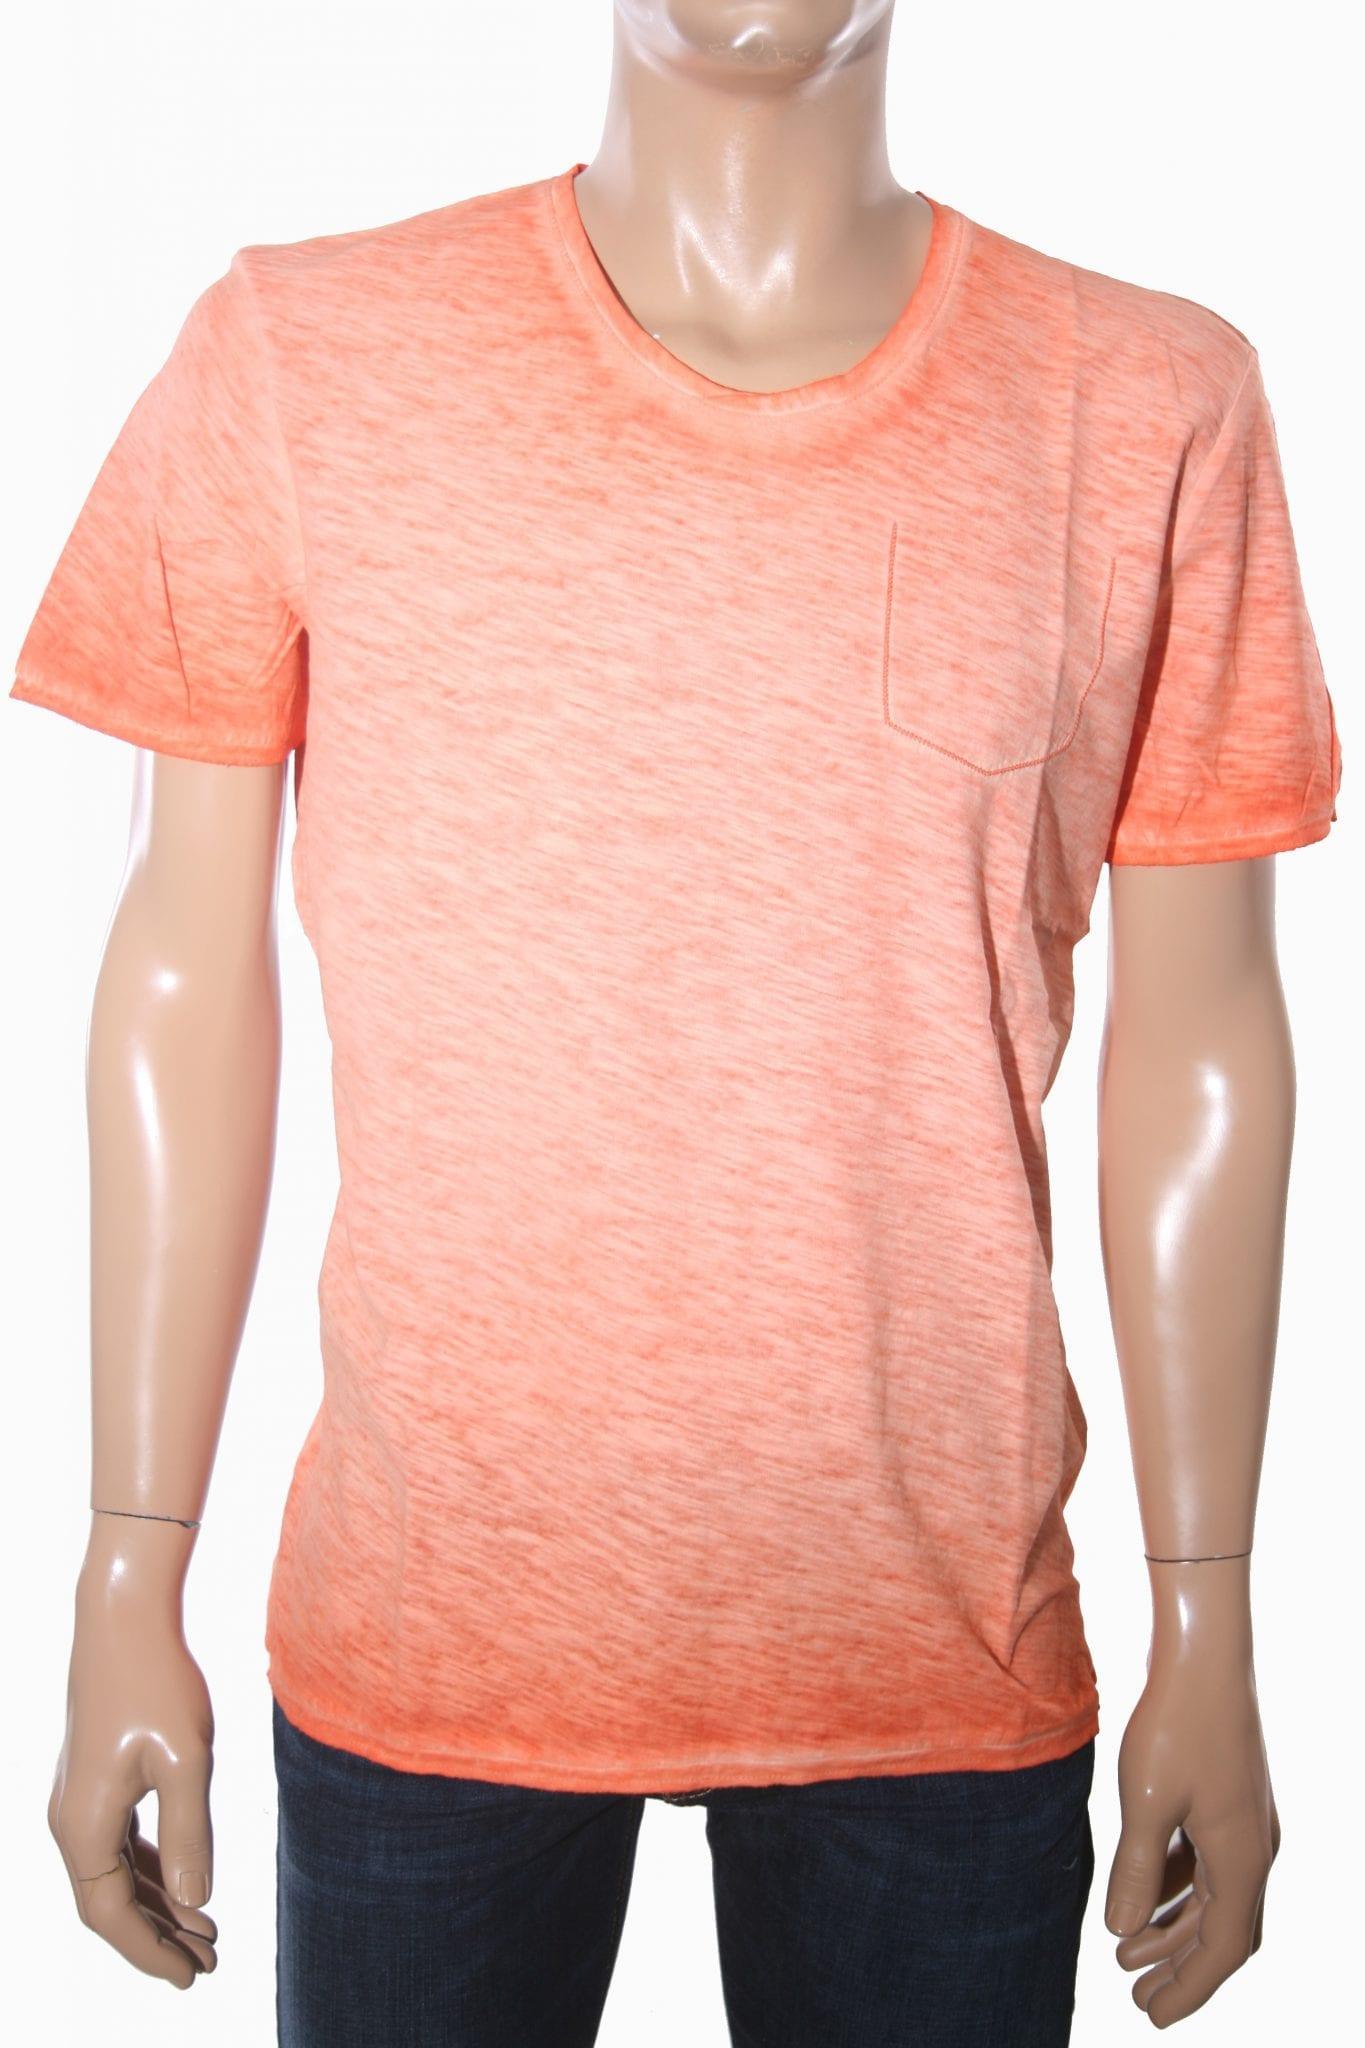 1037709.00.10 Oranje - Jeans und Hosenhaus c90f8bd191